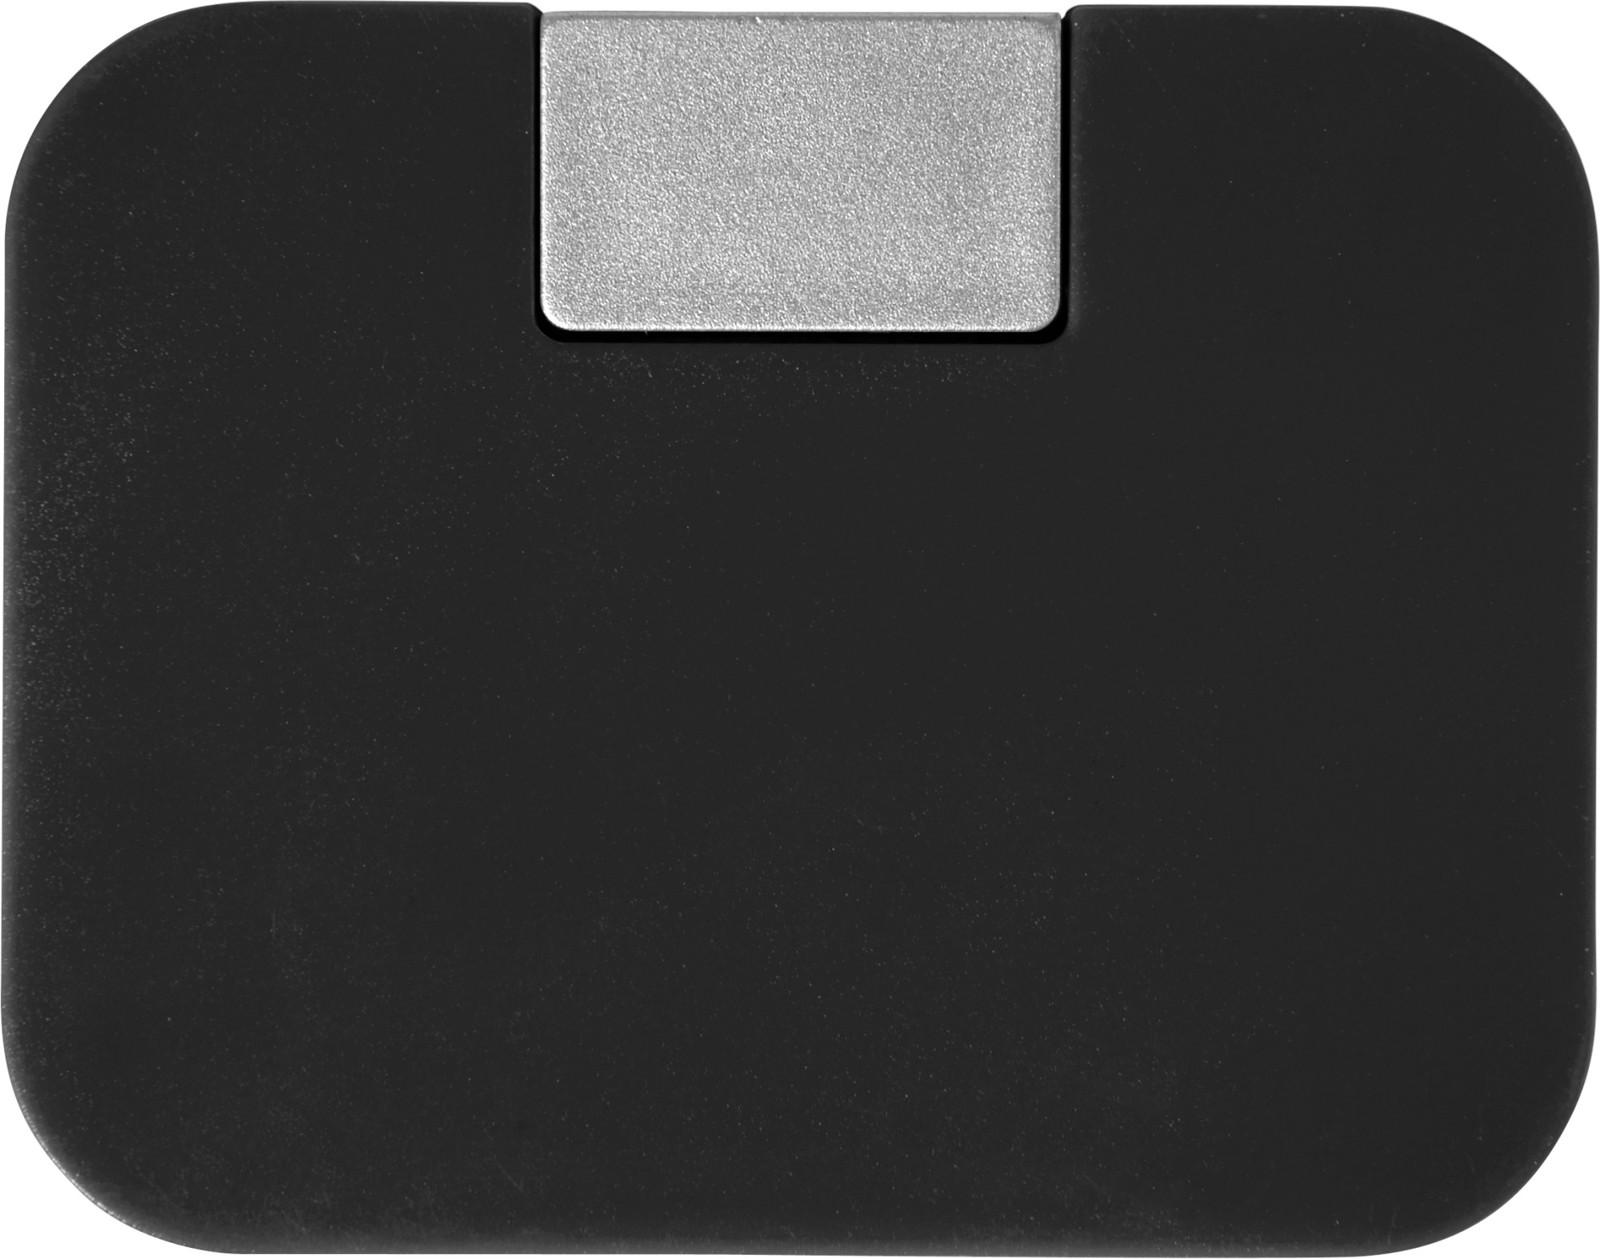 ABS USB hub - Black